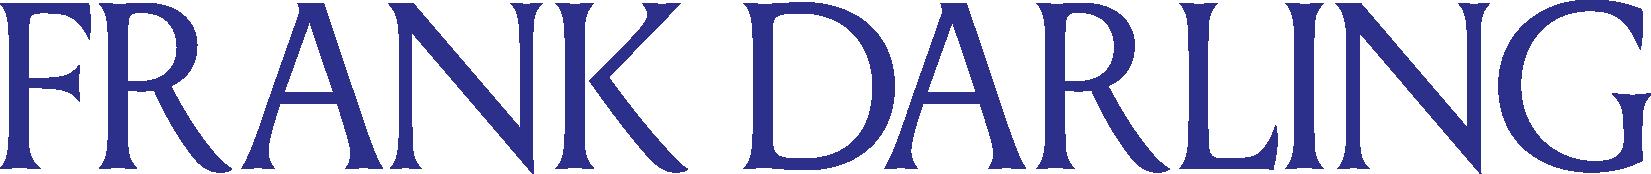 Frank-Darling-Logo-400px-wide.png